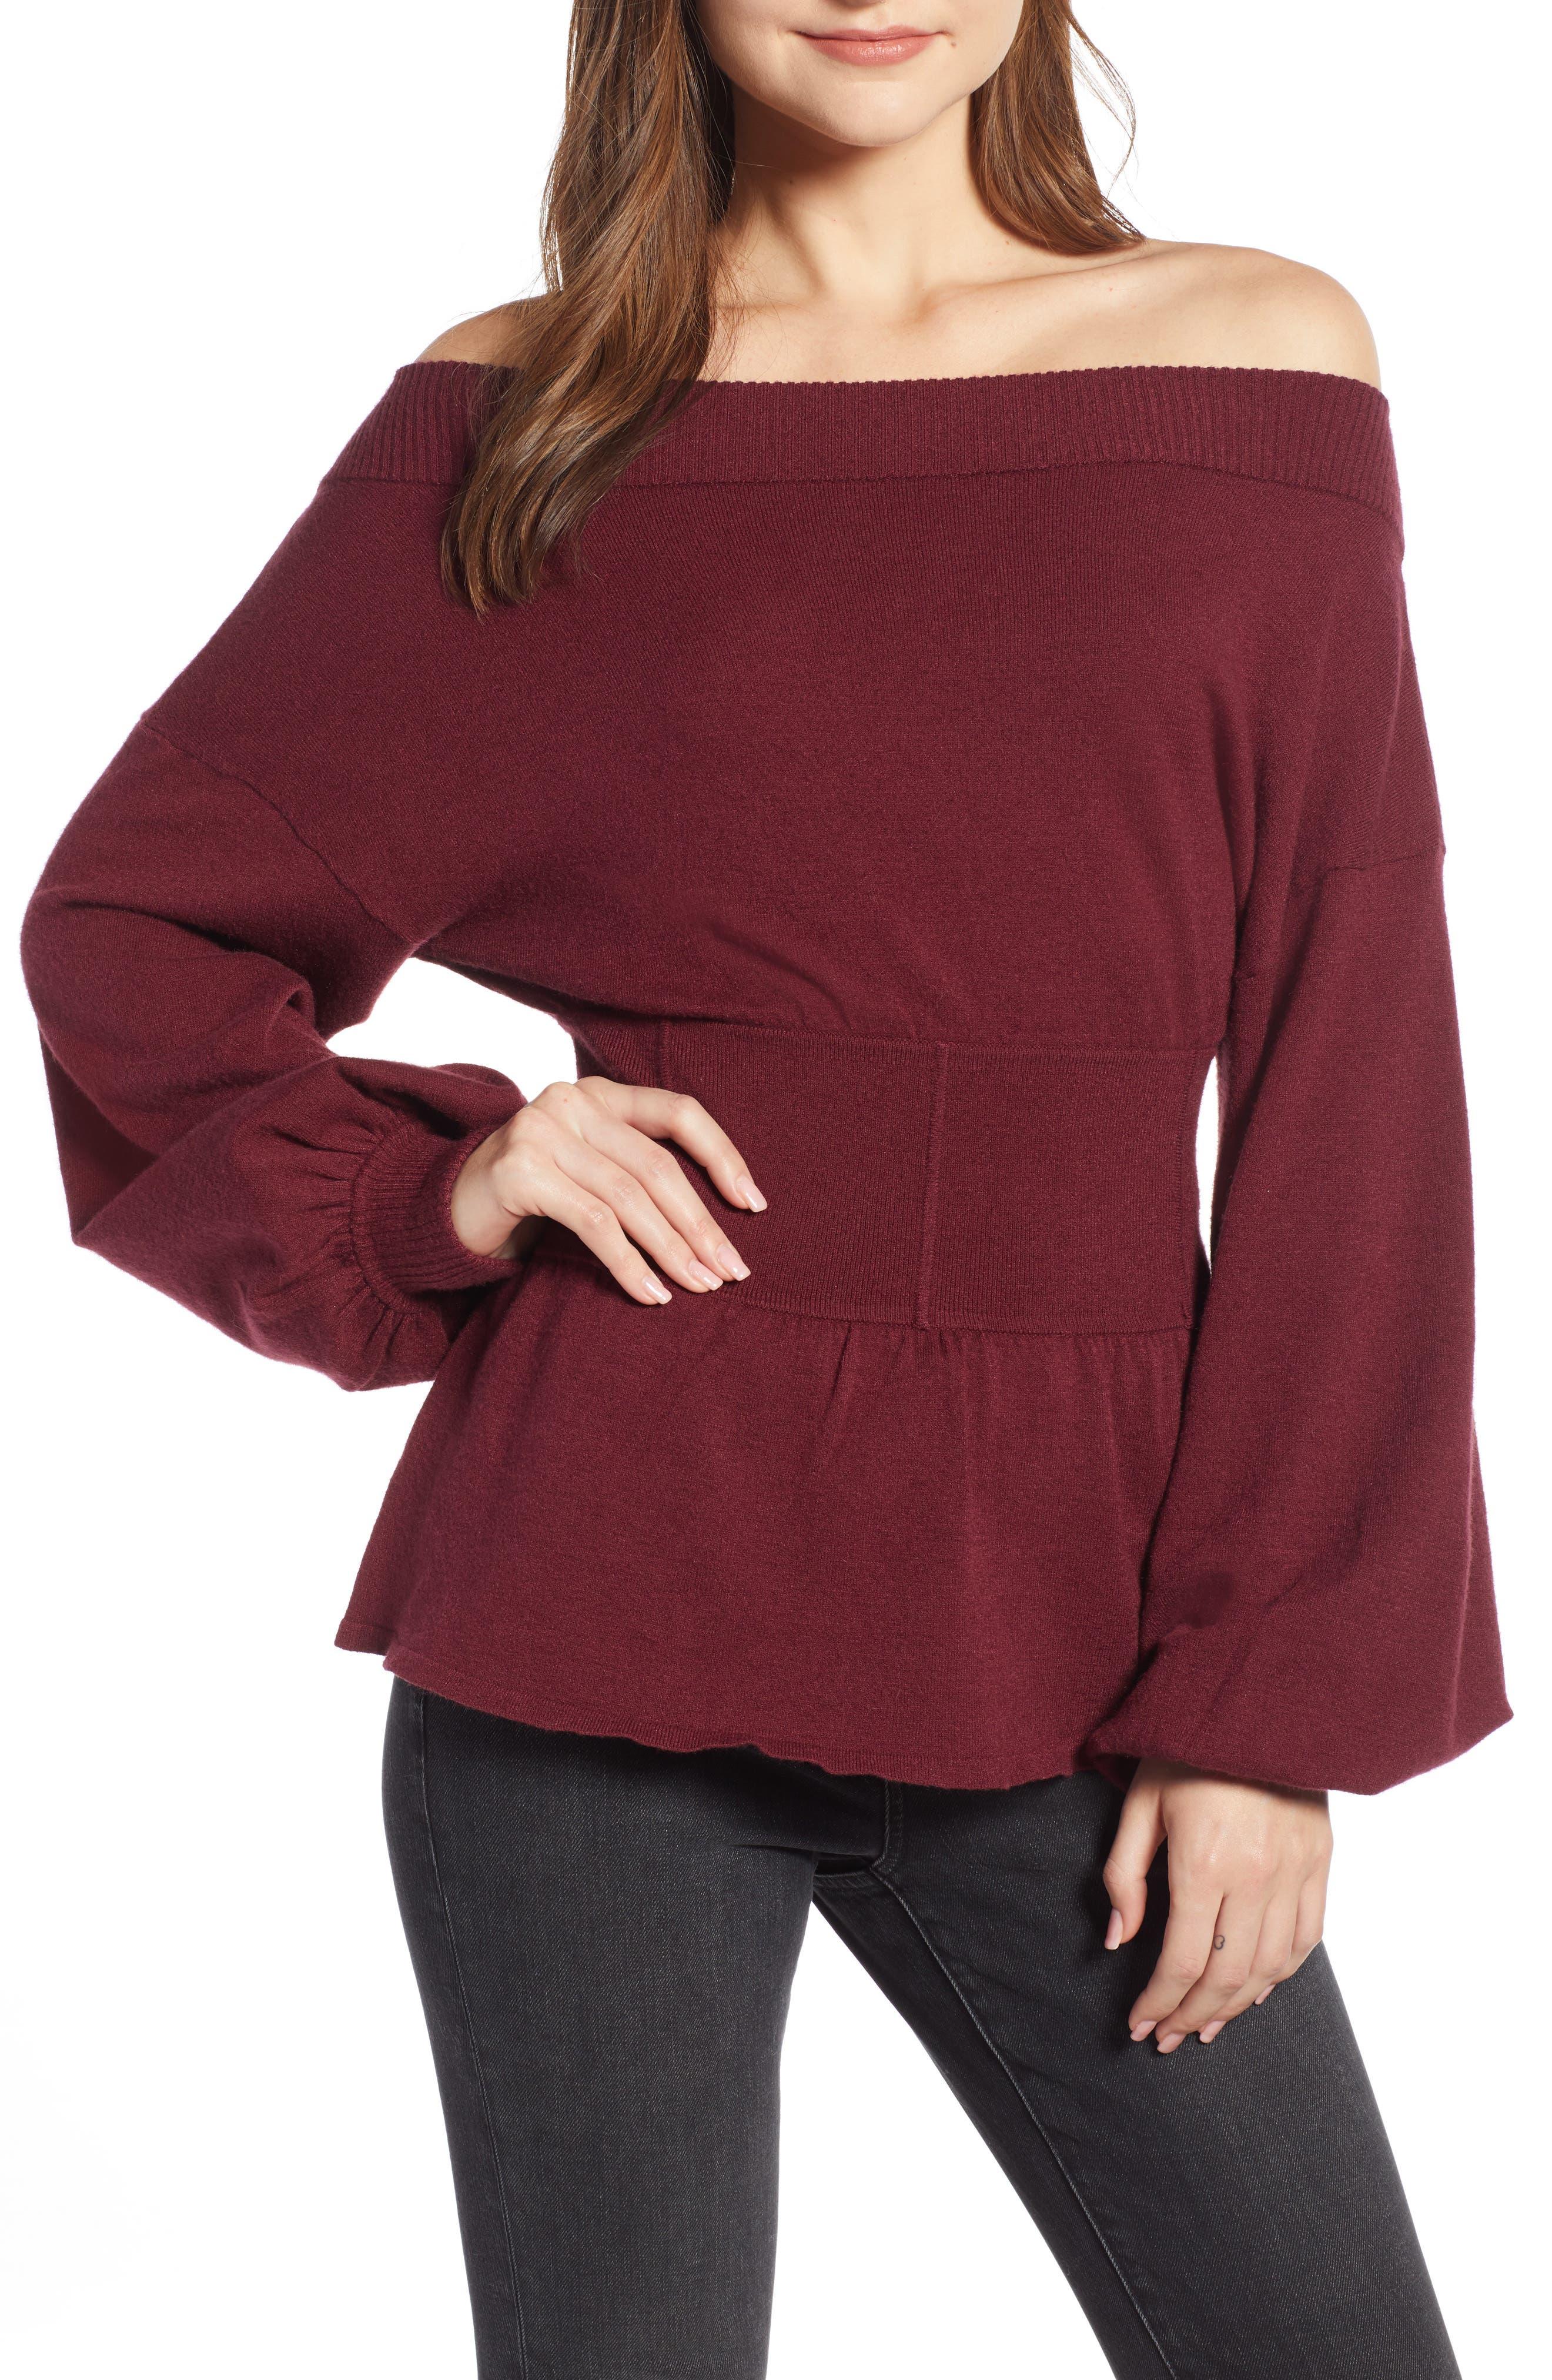 Waist Detail Off the Shoulder Sweater,                             Main thumbnail 1, color,                             601